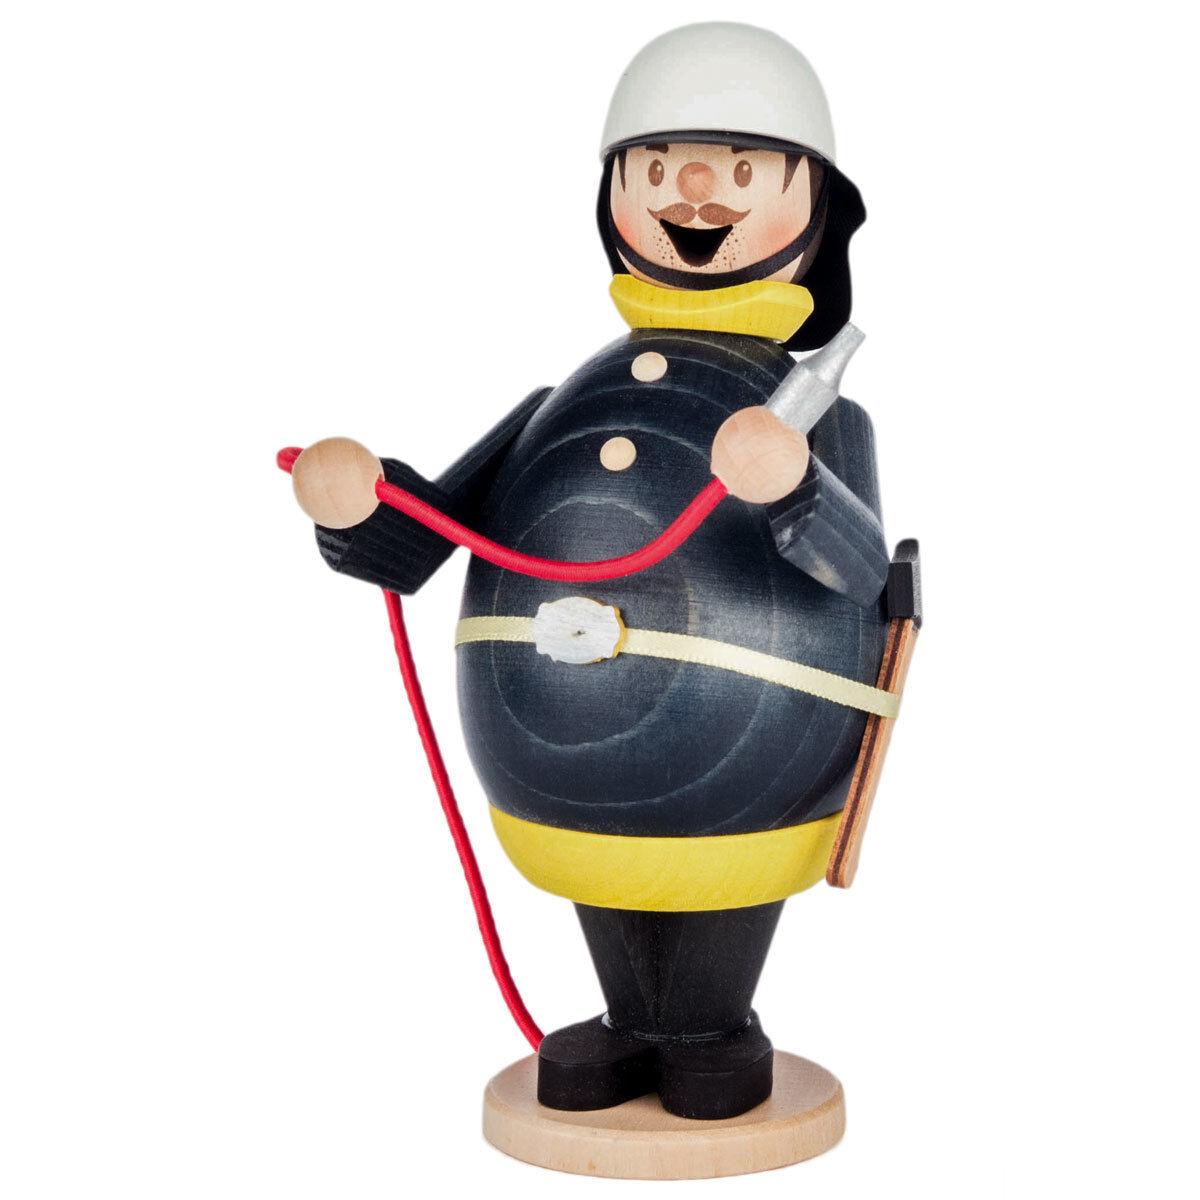 Fireman Wooden German German German Incense Burner Smoker -  Fire Fighter - Made in Germany fe5fc6